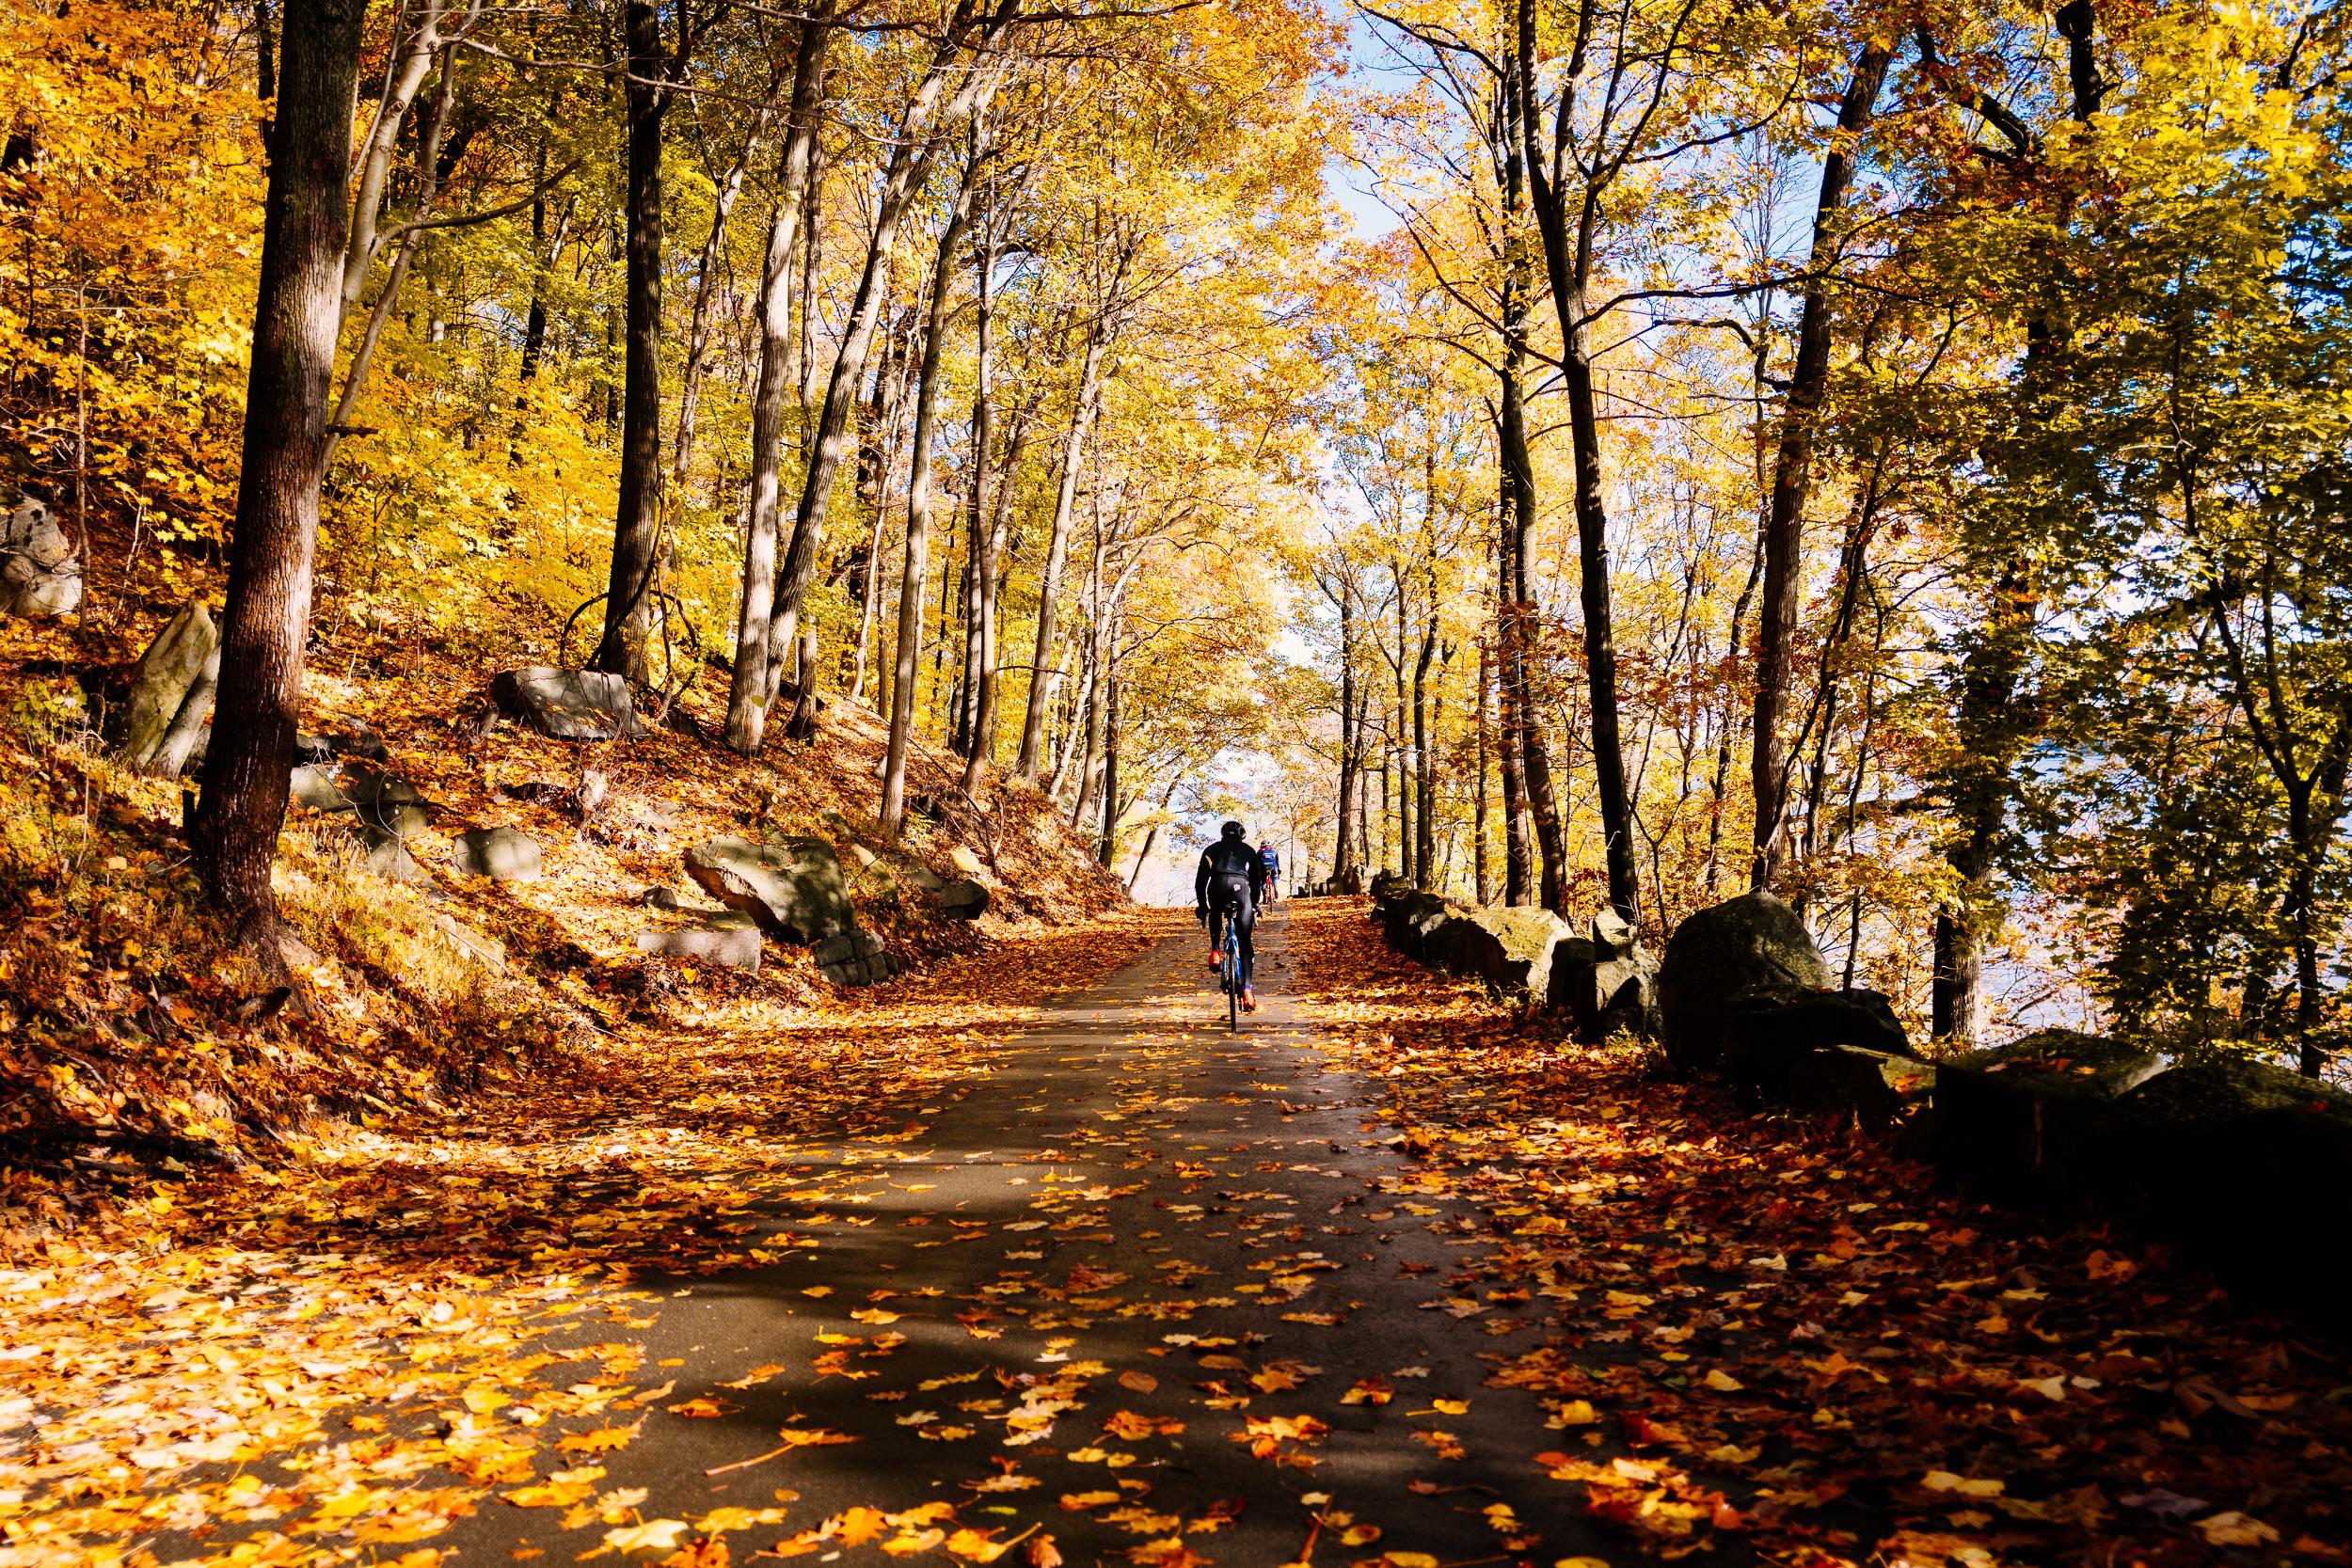 photo-rhetoric-to-be-determined-river-road-fall-foliage-5027.jpg